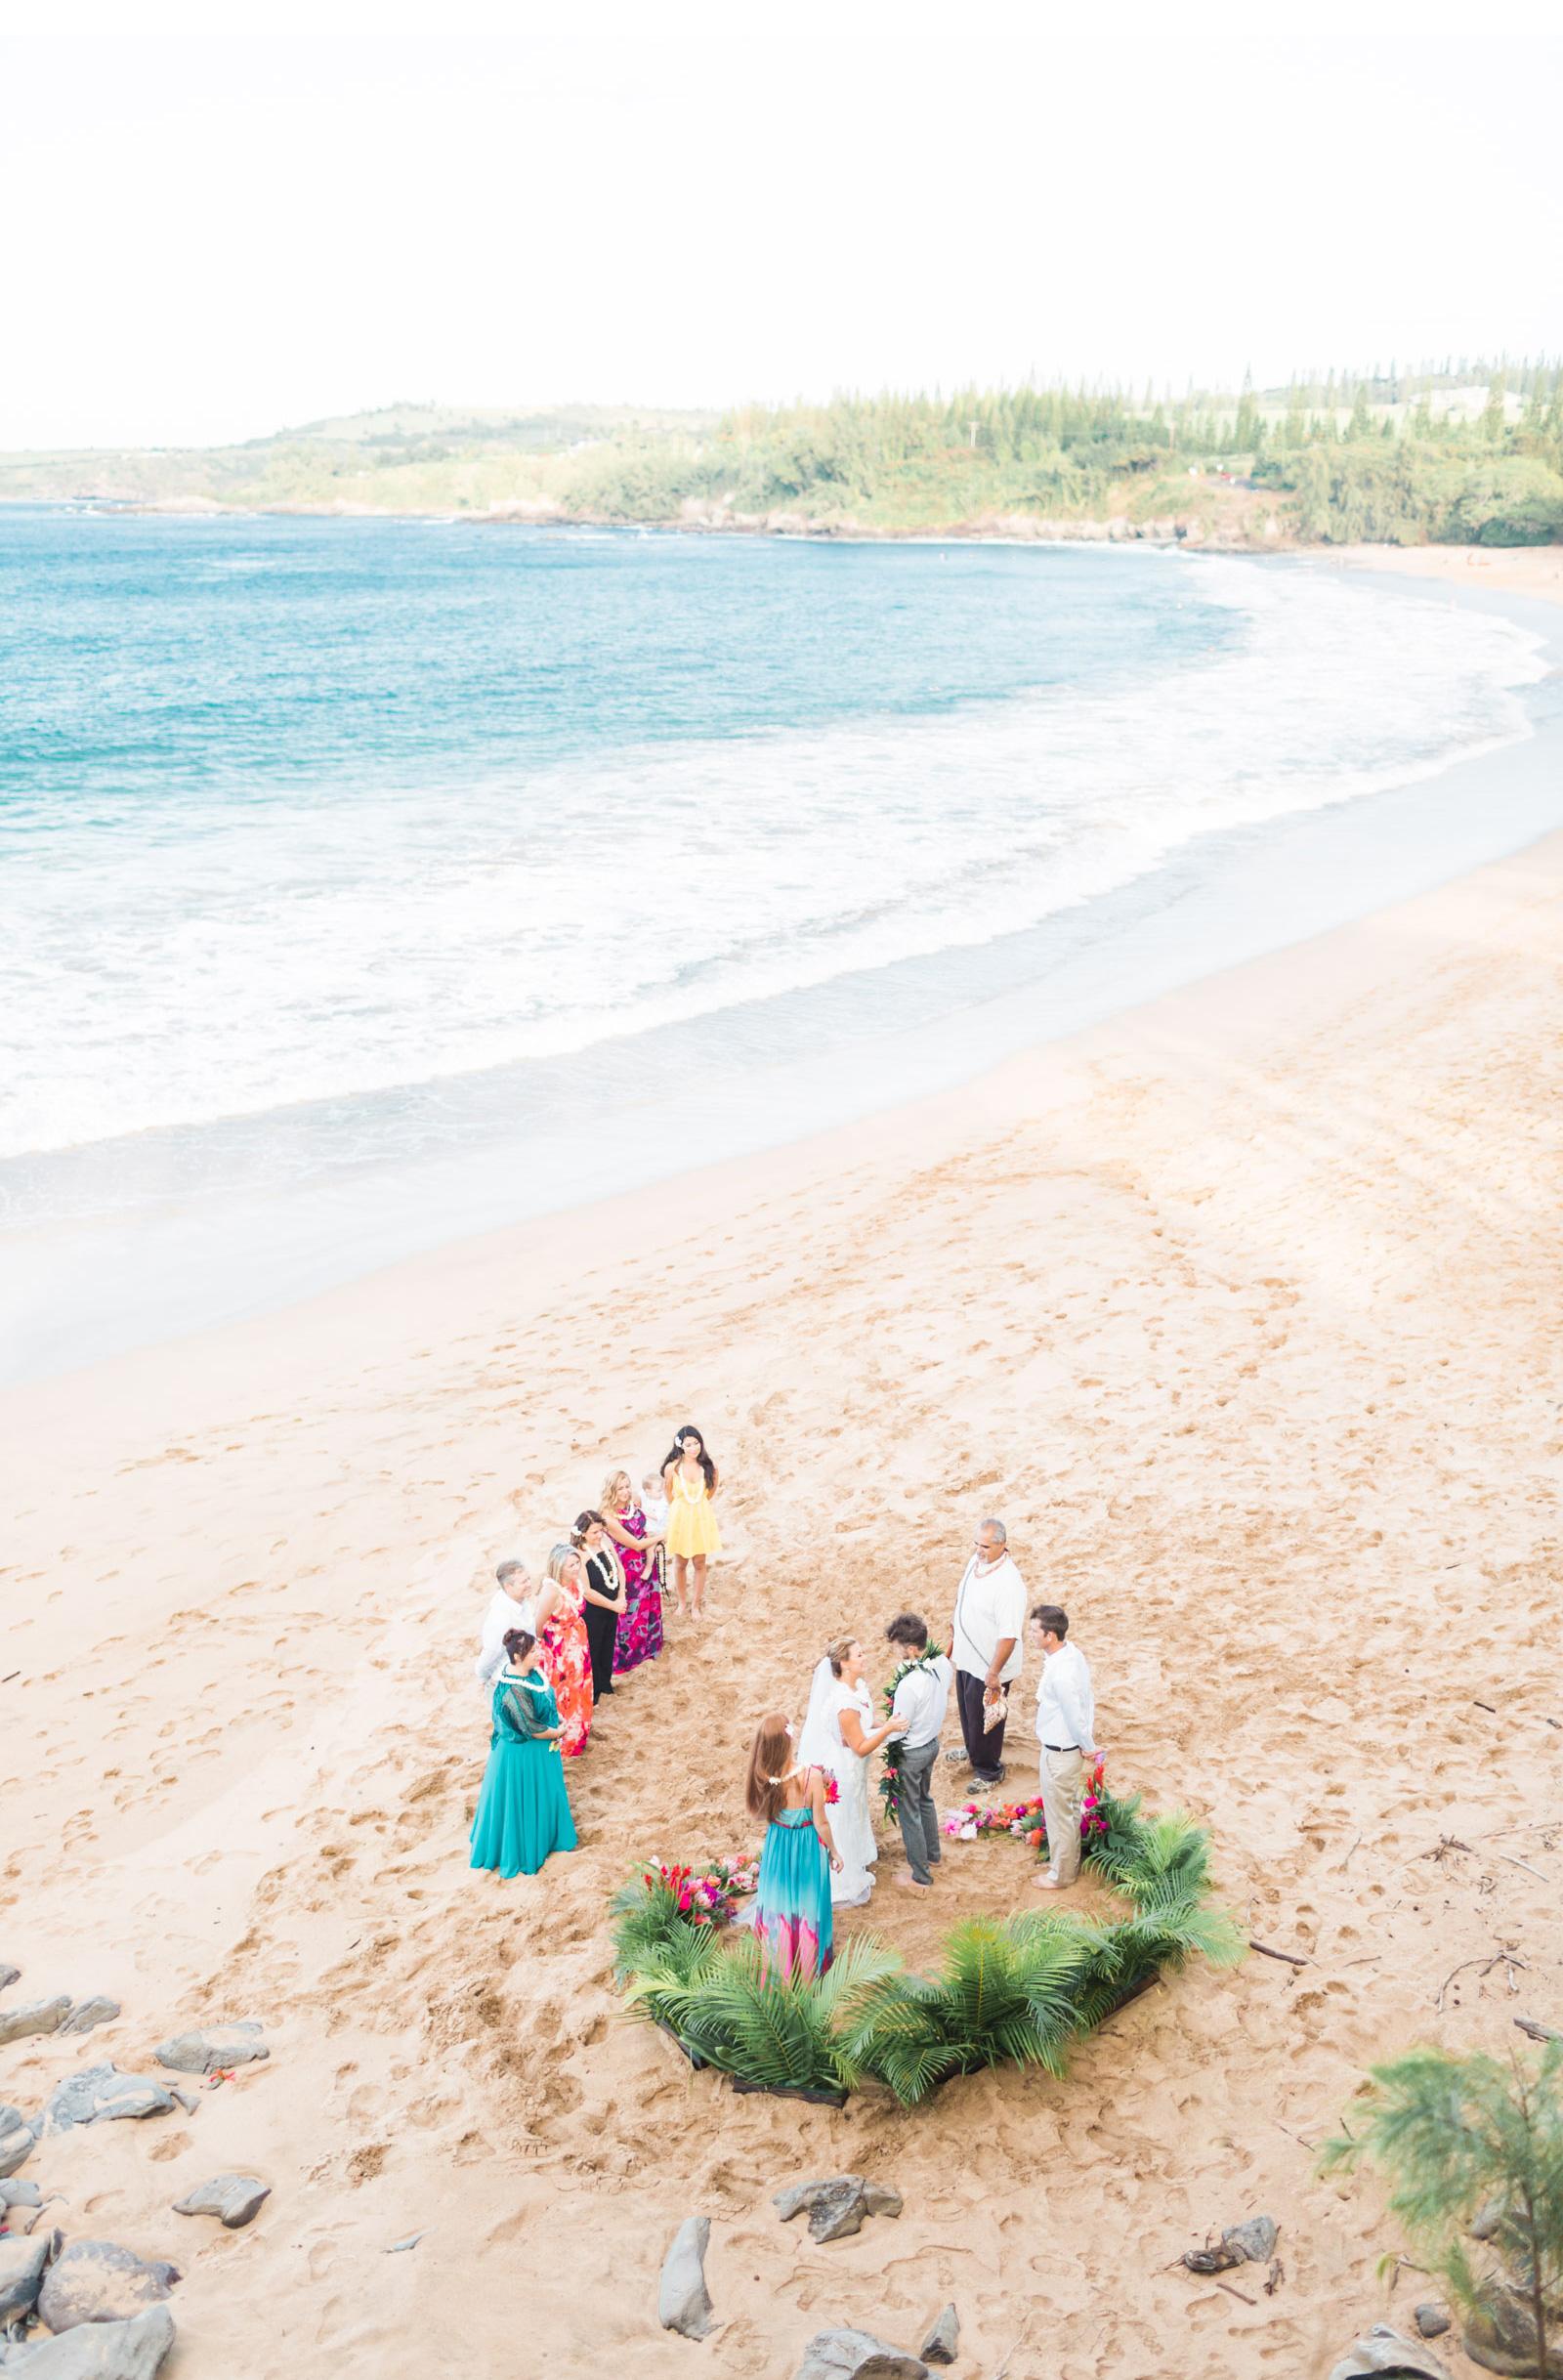 Natalie-Schutt-Photography--Central-Coast-Wedding-Photographer_03.jpg